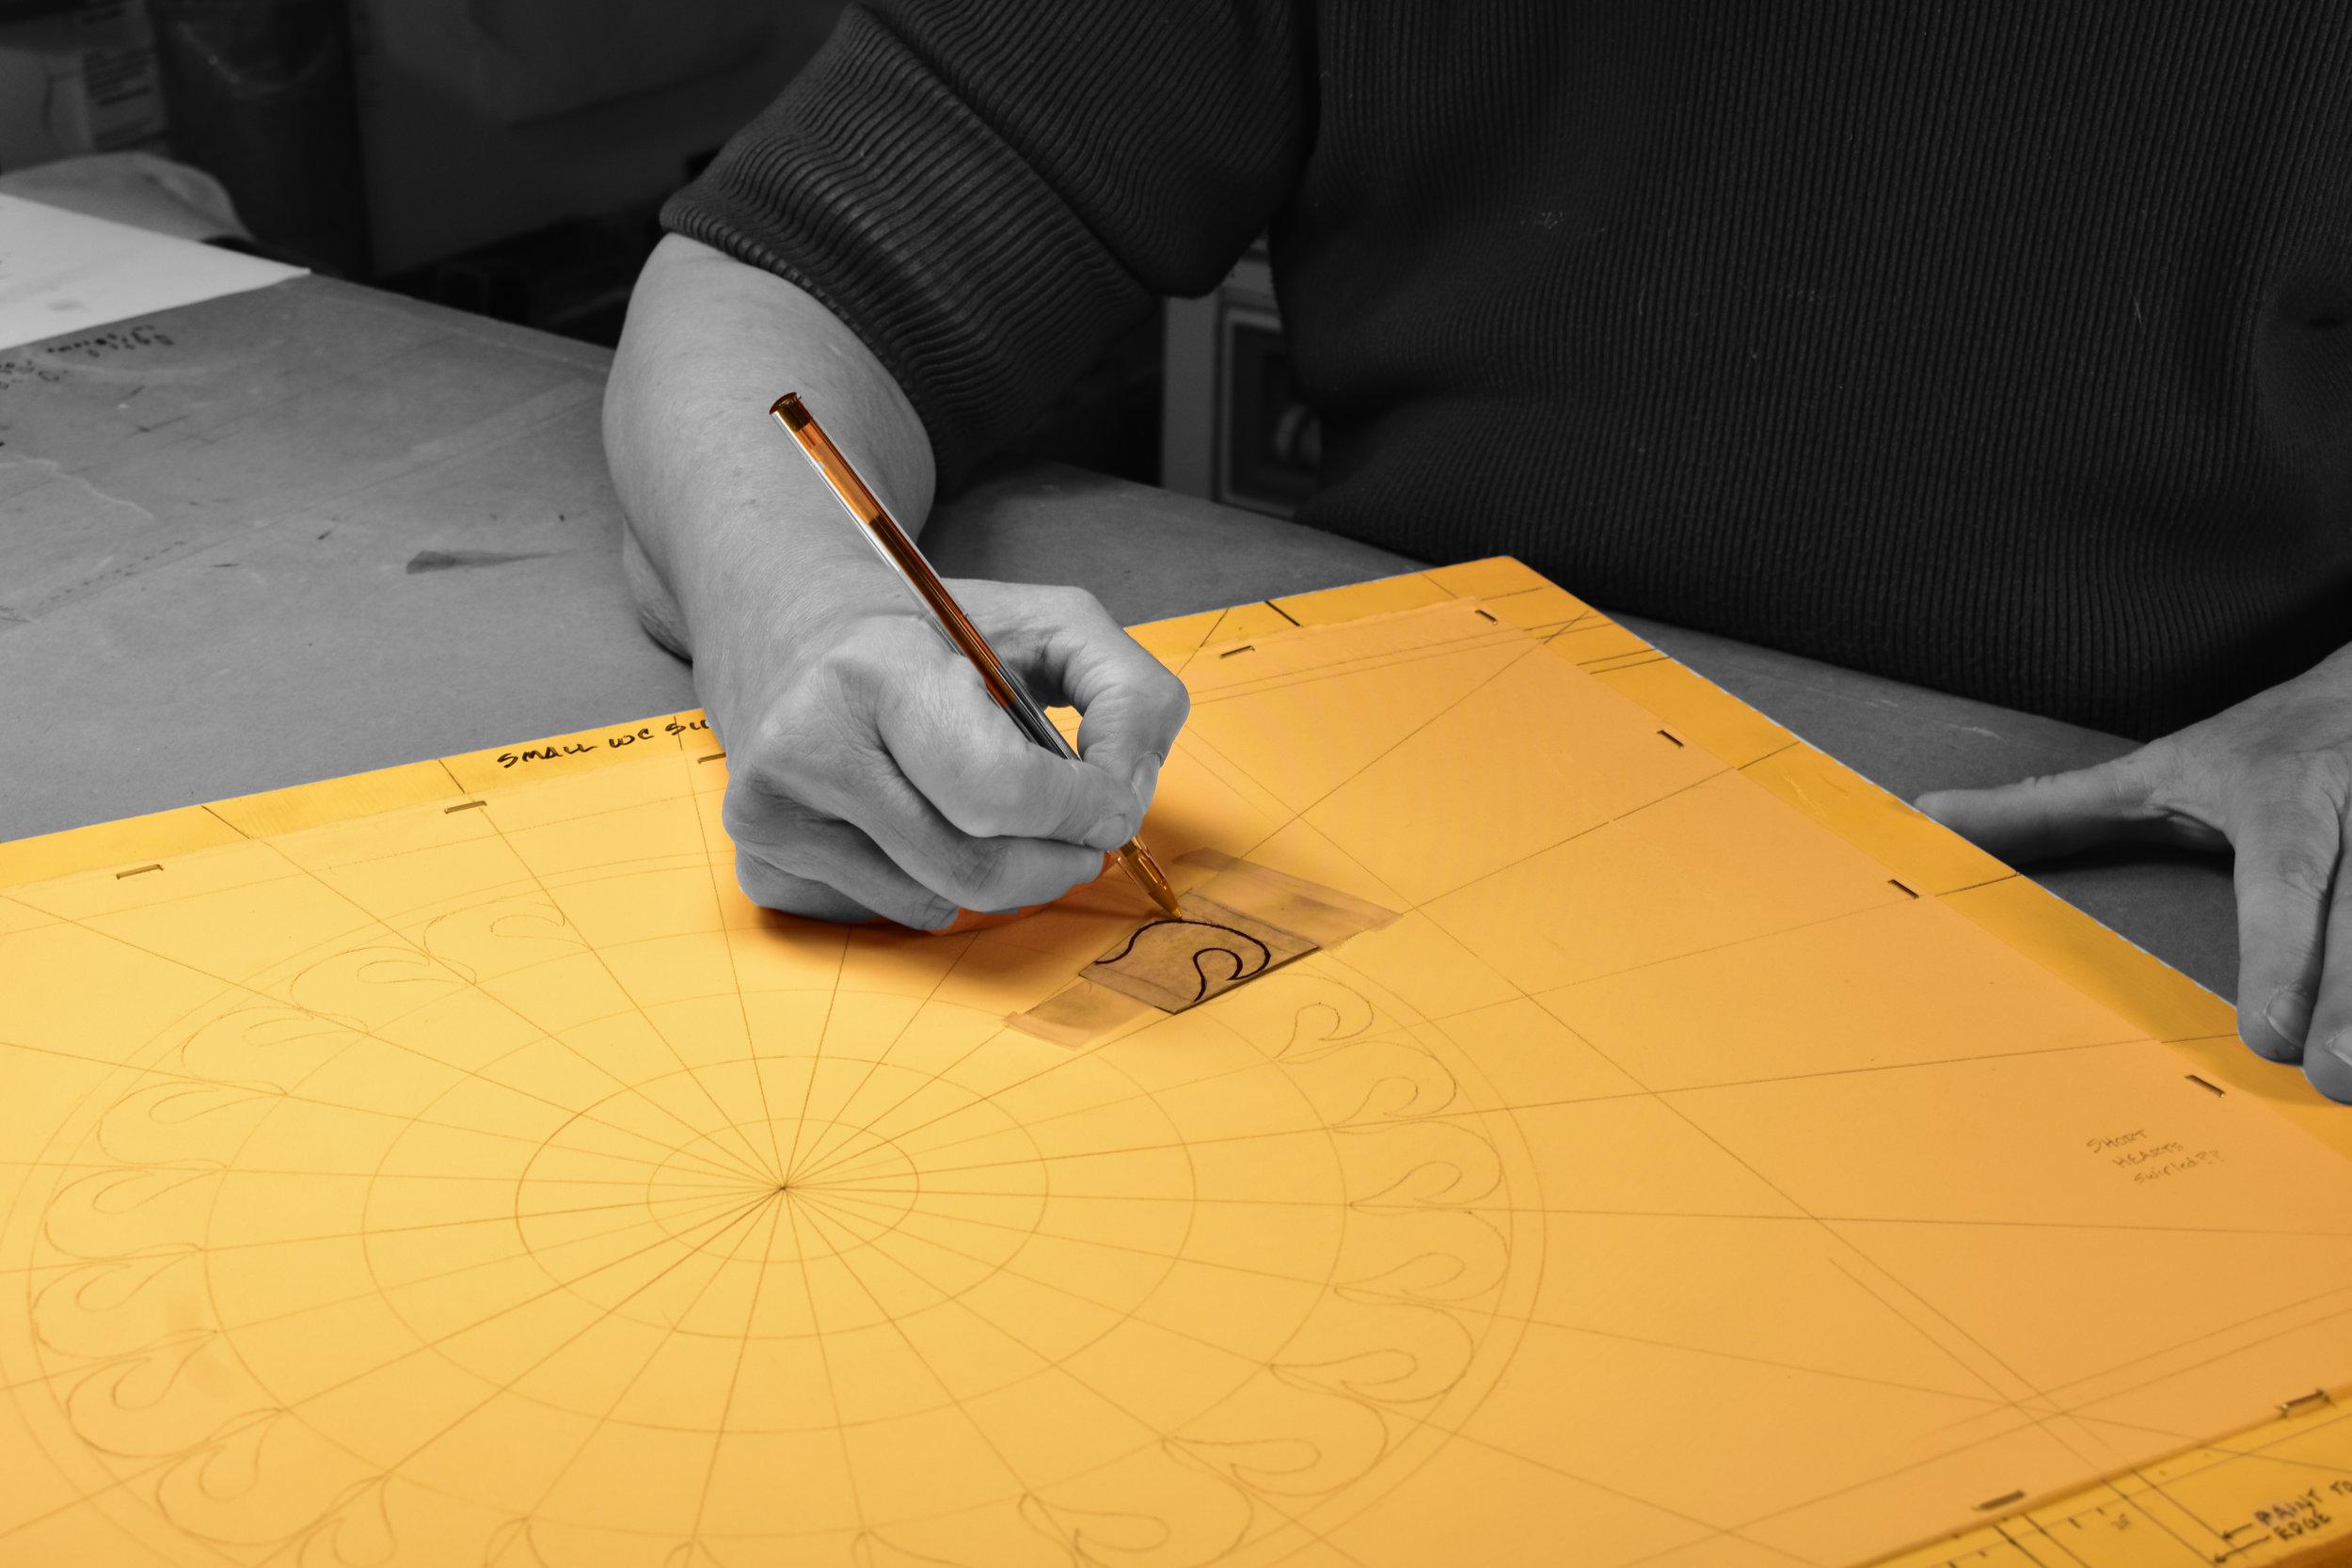 Penciling the design